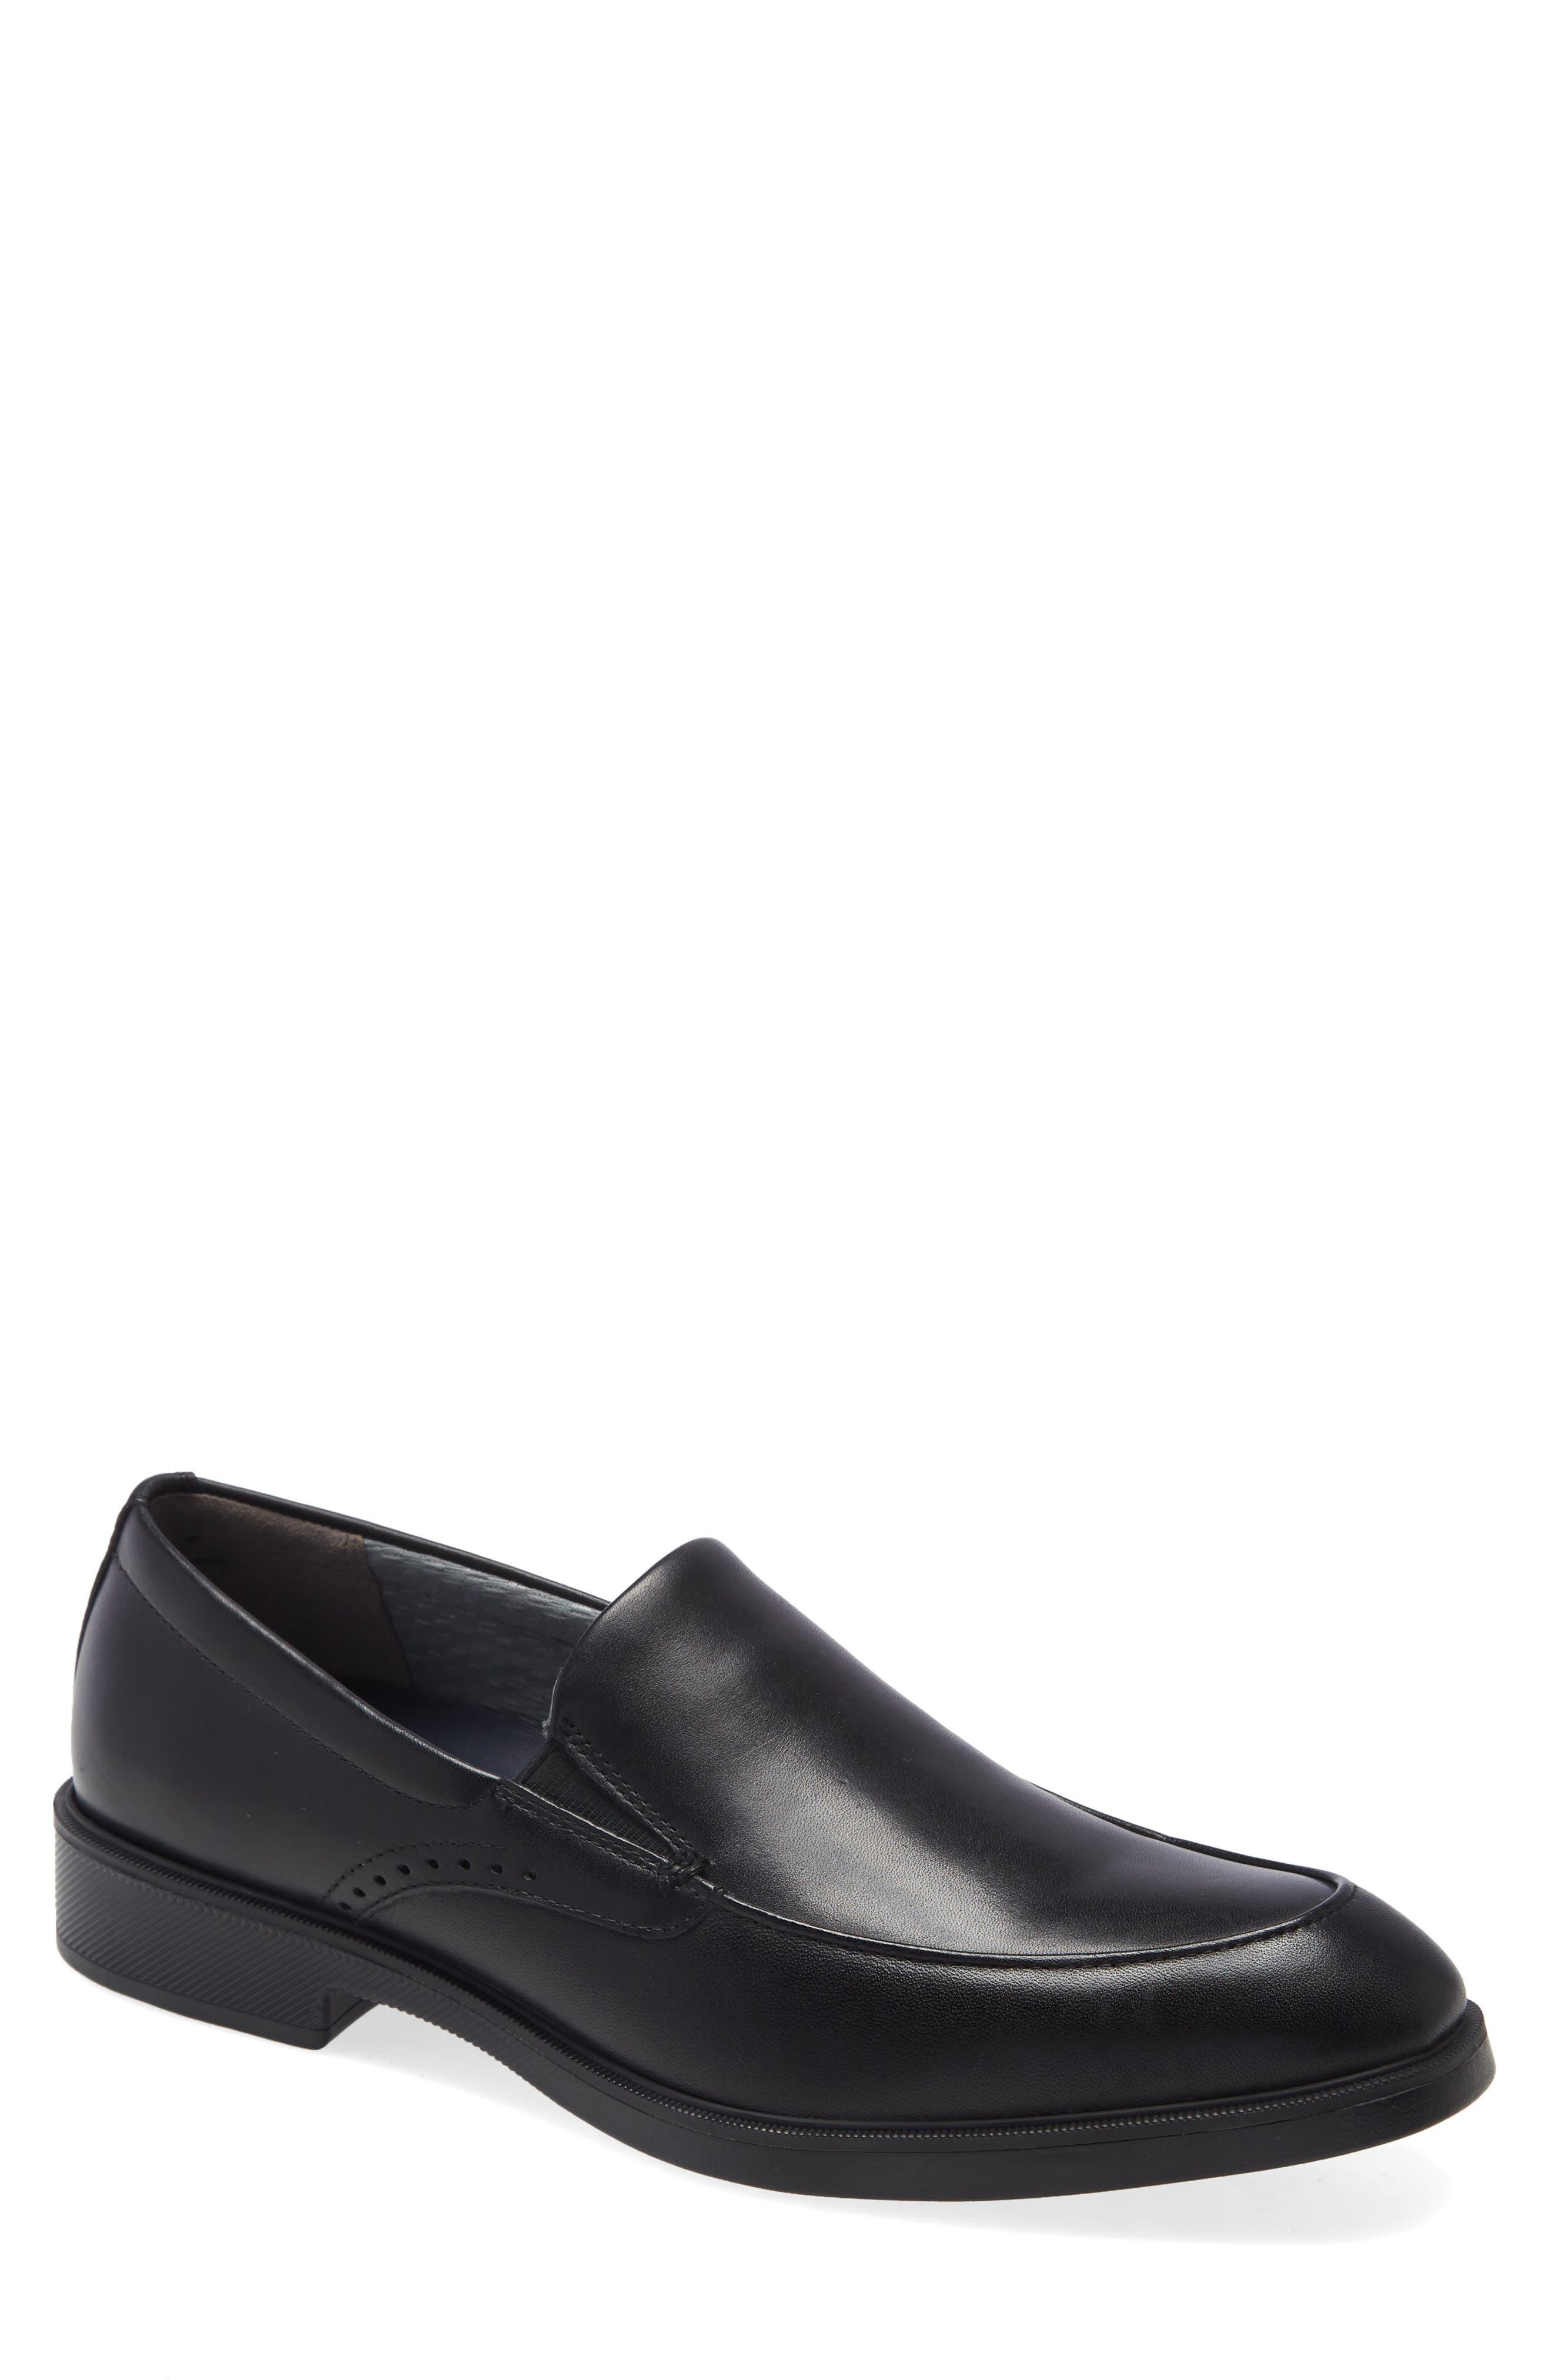 Maddox Venetian Loafer